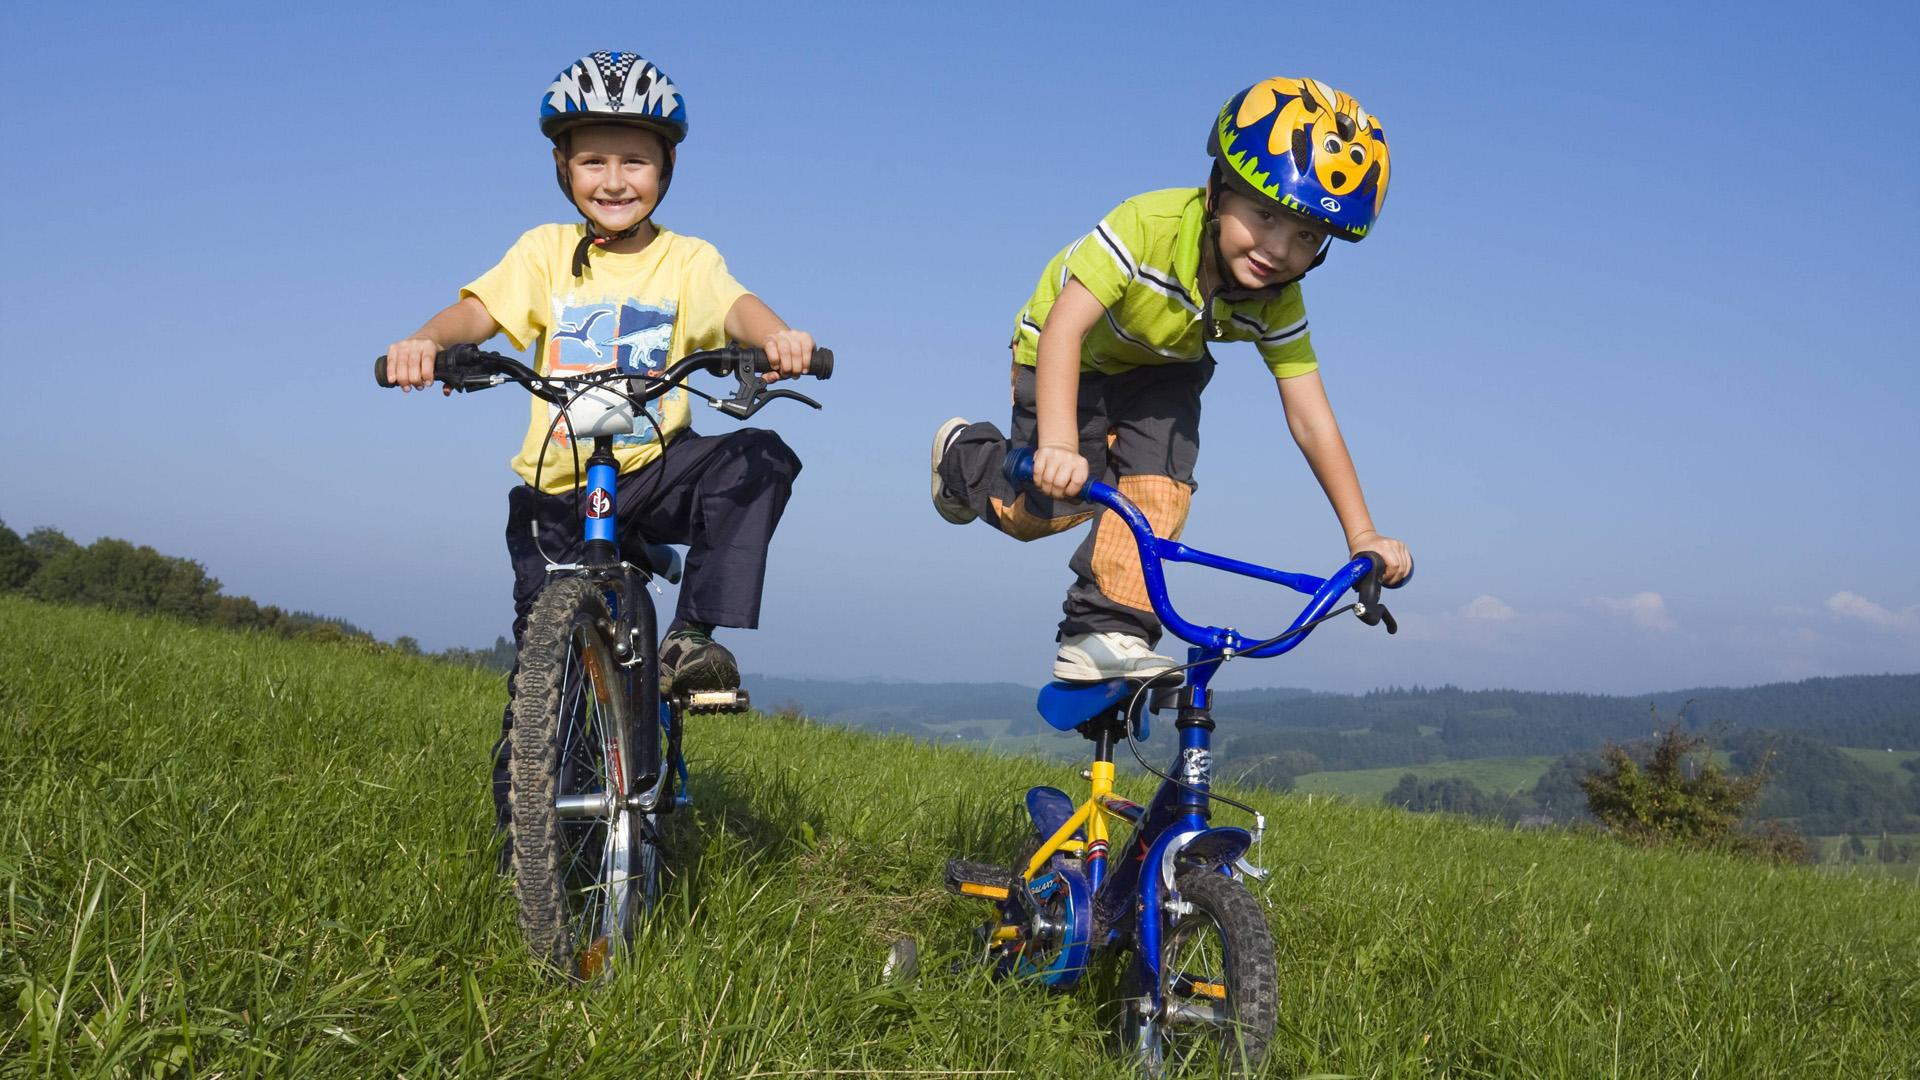 Kinder mit Rad